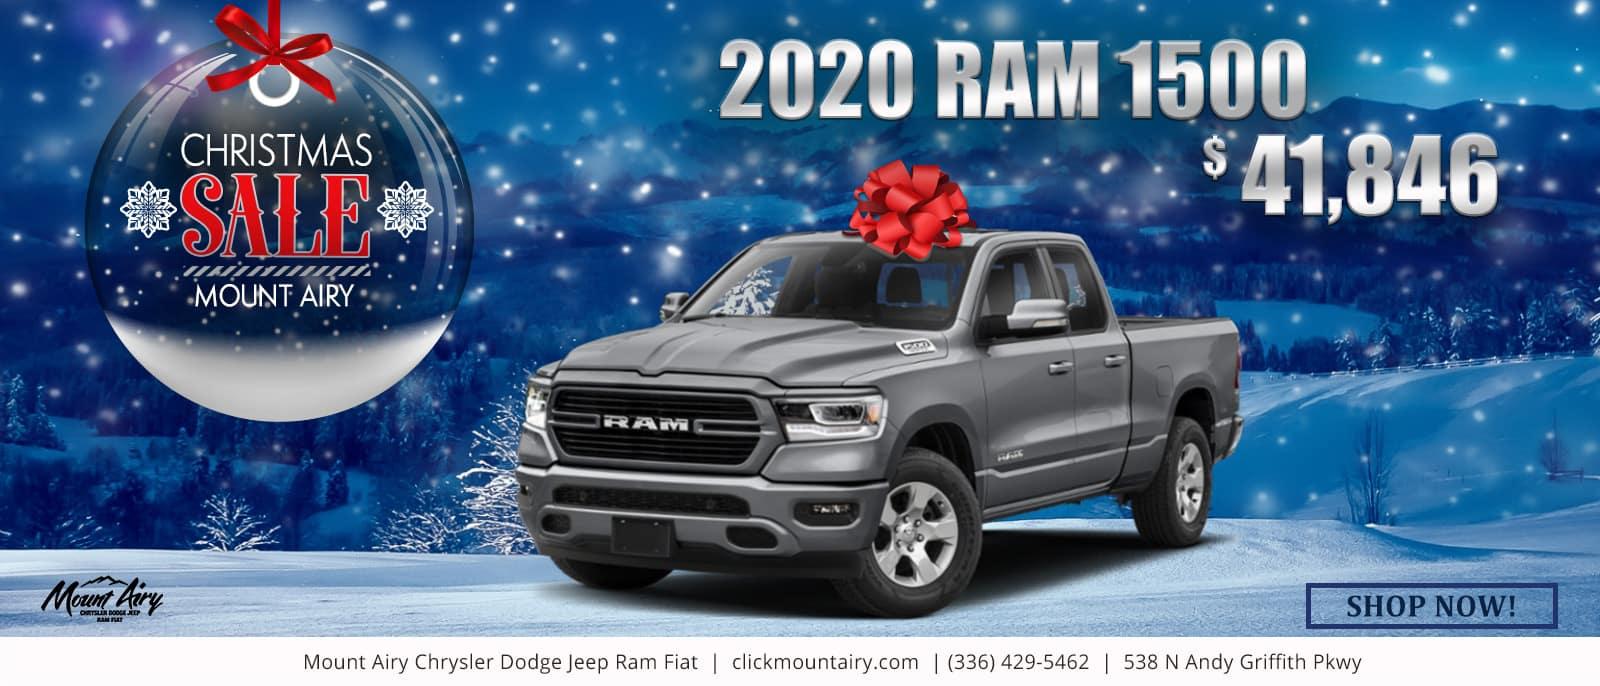 CDJRF_Nov-Dec_2020_Slider_Ram1500